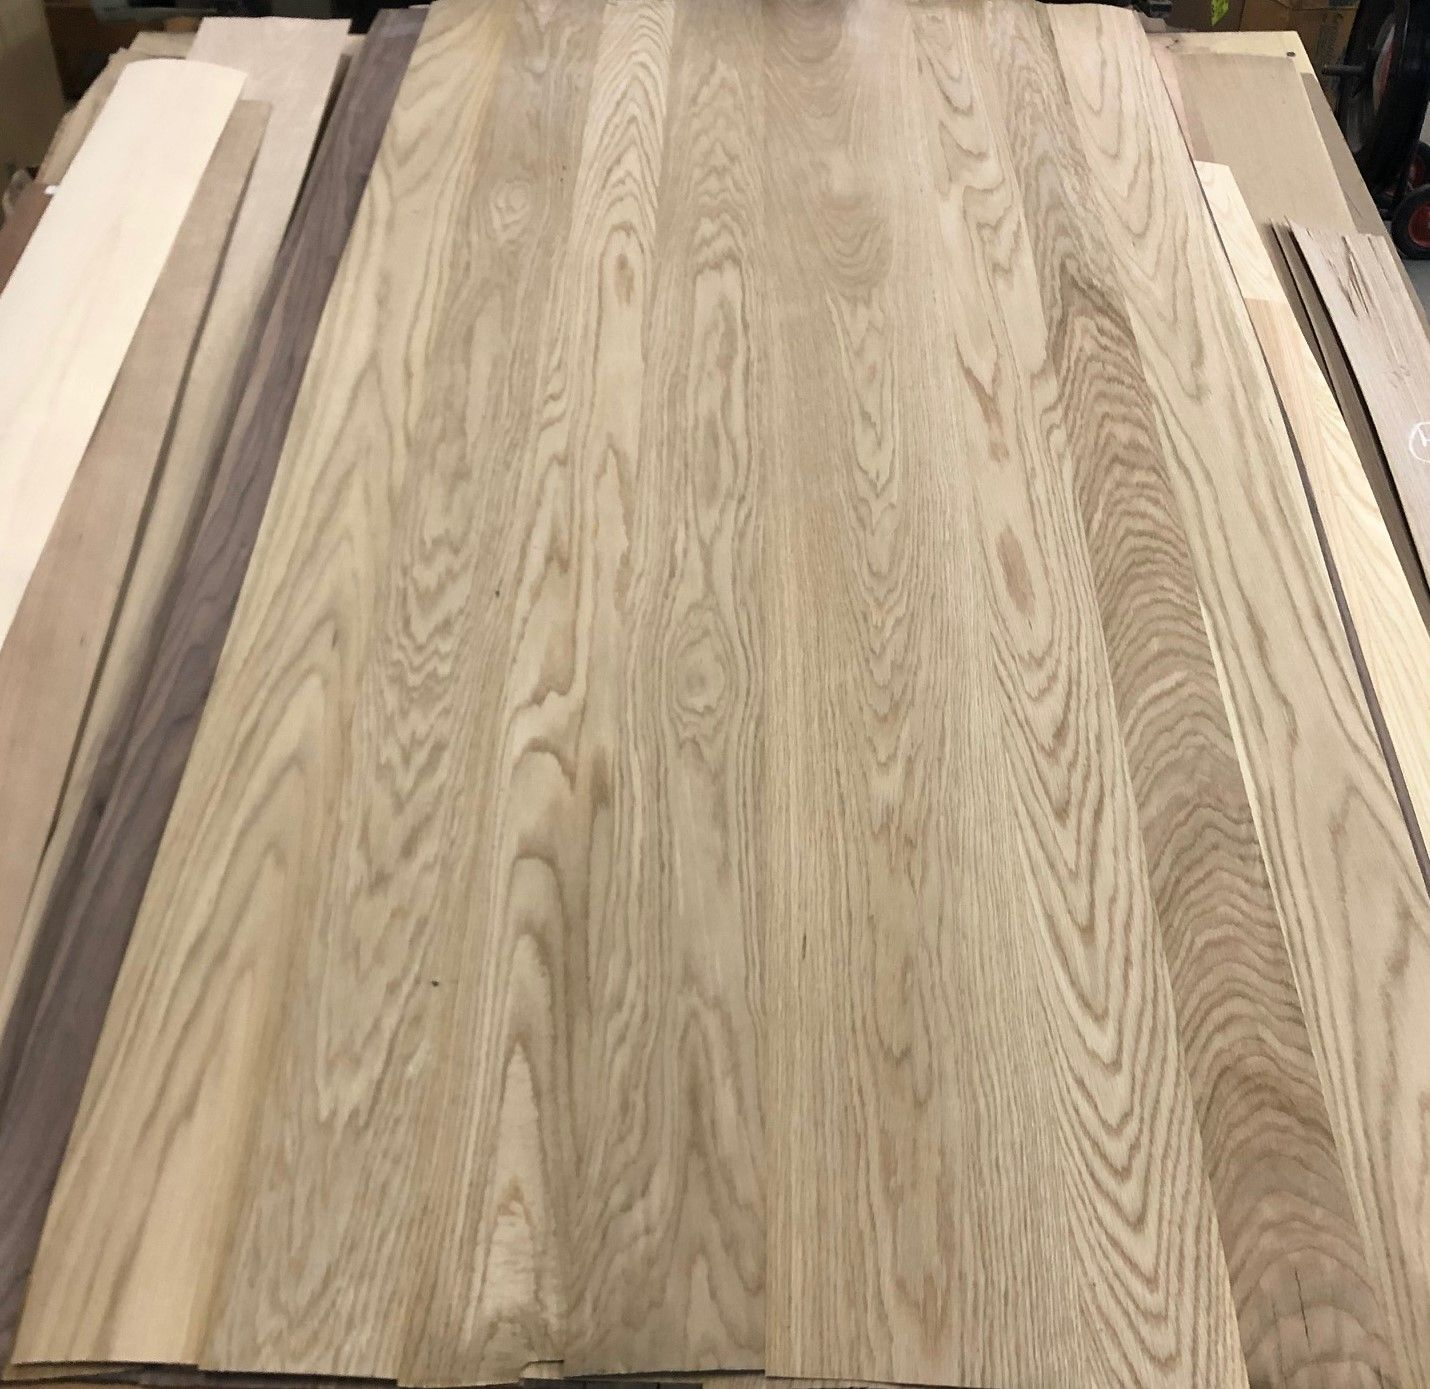 Artisan Thick Veneer 1 16 Random White Oak Face In 2020 White Oak Wood Veneer Oak